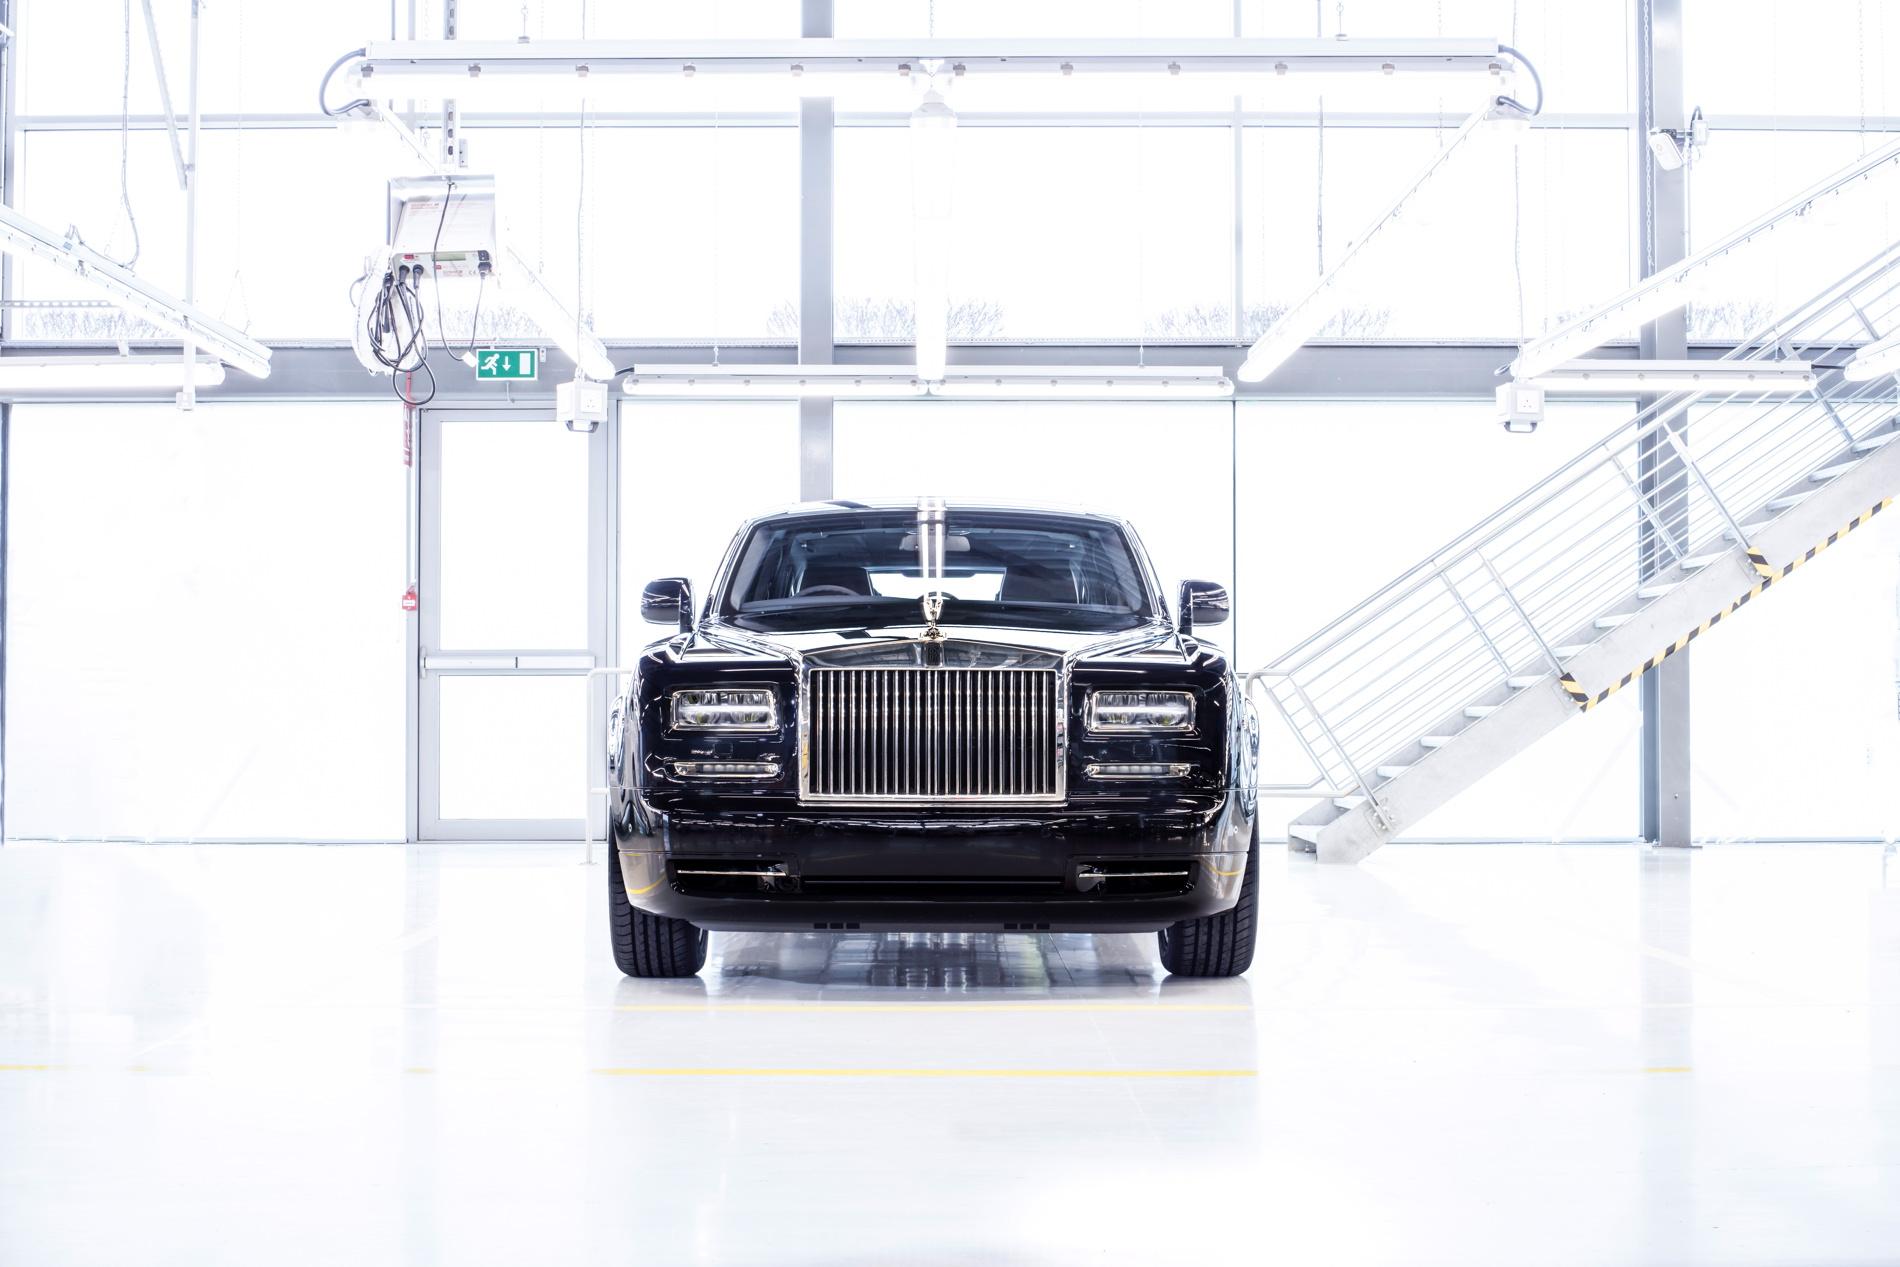 Final Phantom Rolls Royce Celebrates End of Generation VI 07